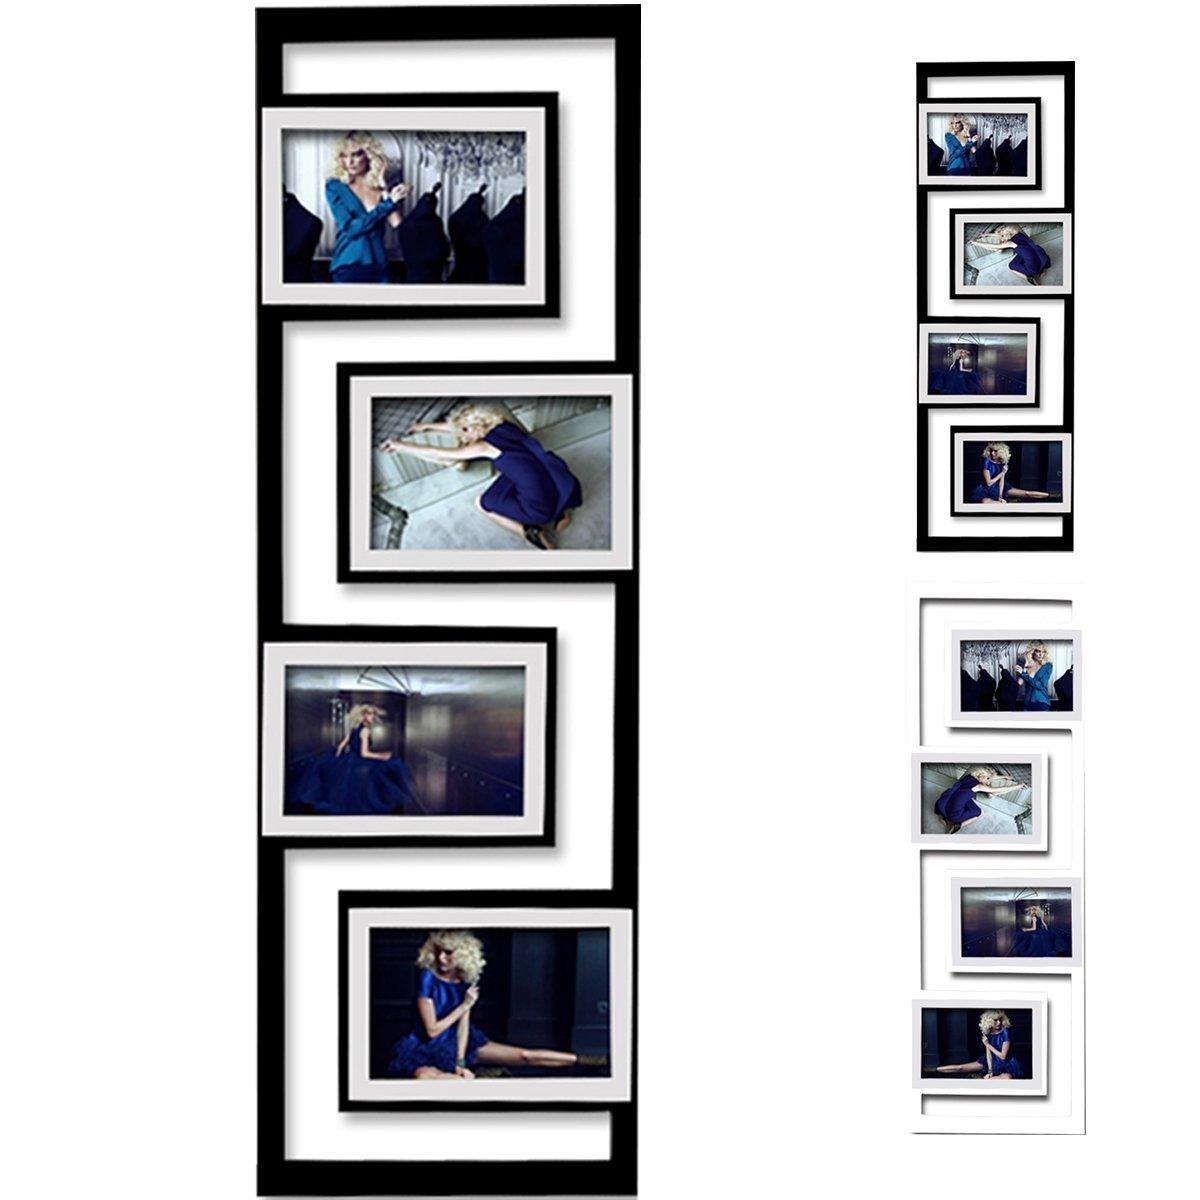 Amazon.de: 4 Fotos Collage Bilderrahmen #3, Holz Rahmen, zum Hängen ...